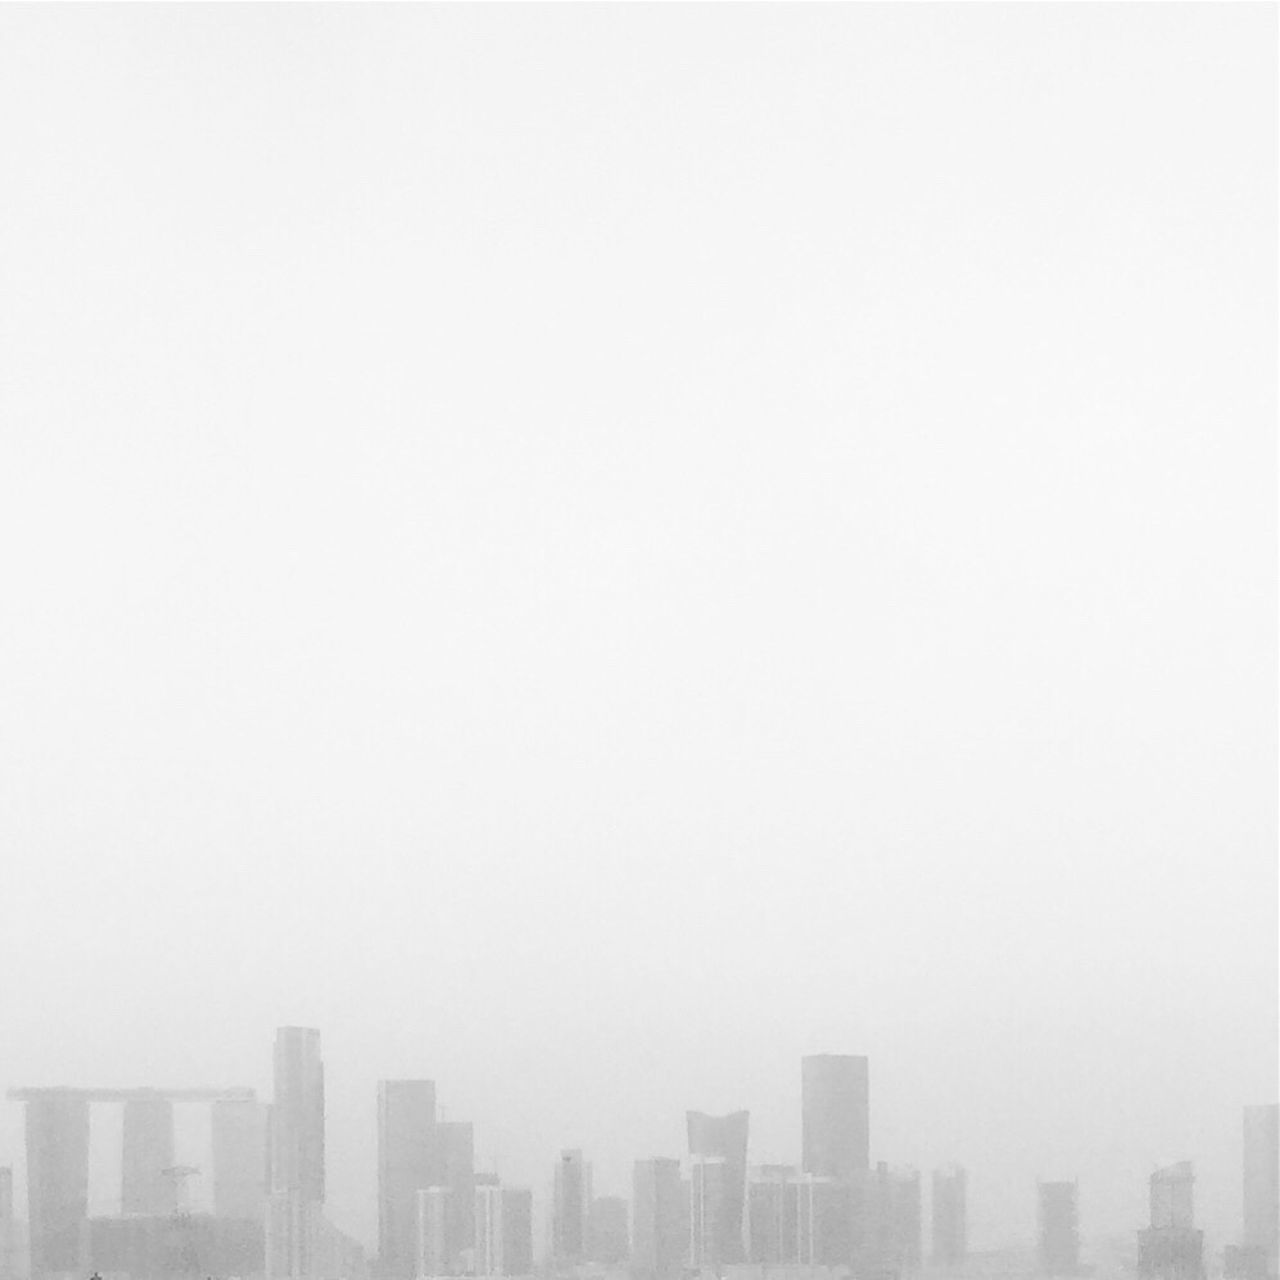 Monochrome Photography Cityscape